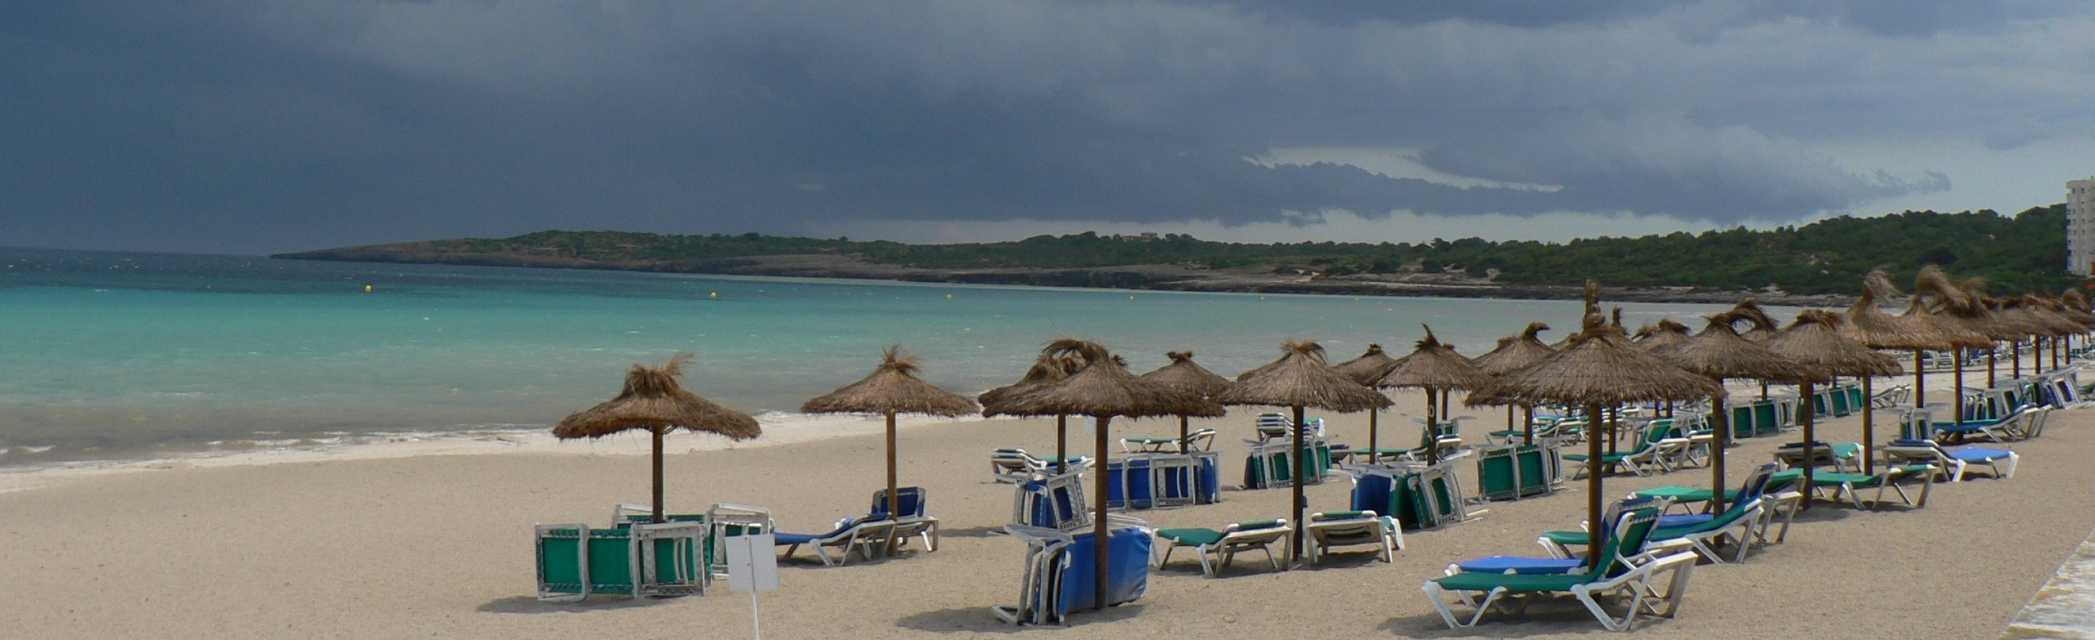 Flugbörse Reisebüro Cala Millor 2km Strand Promenade